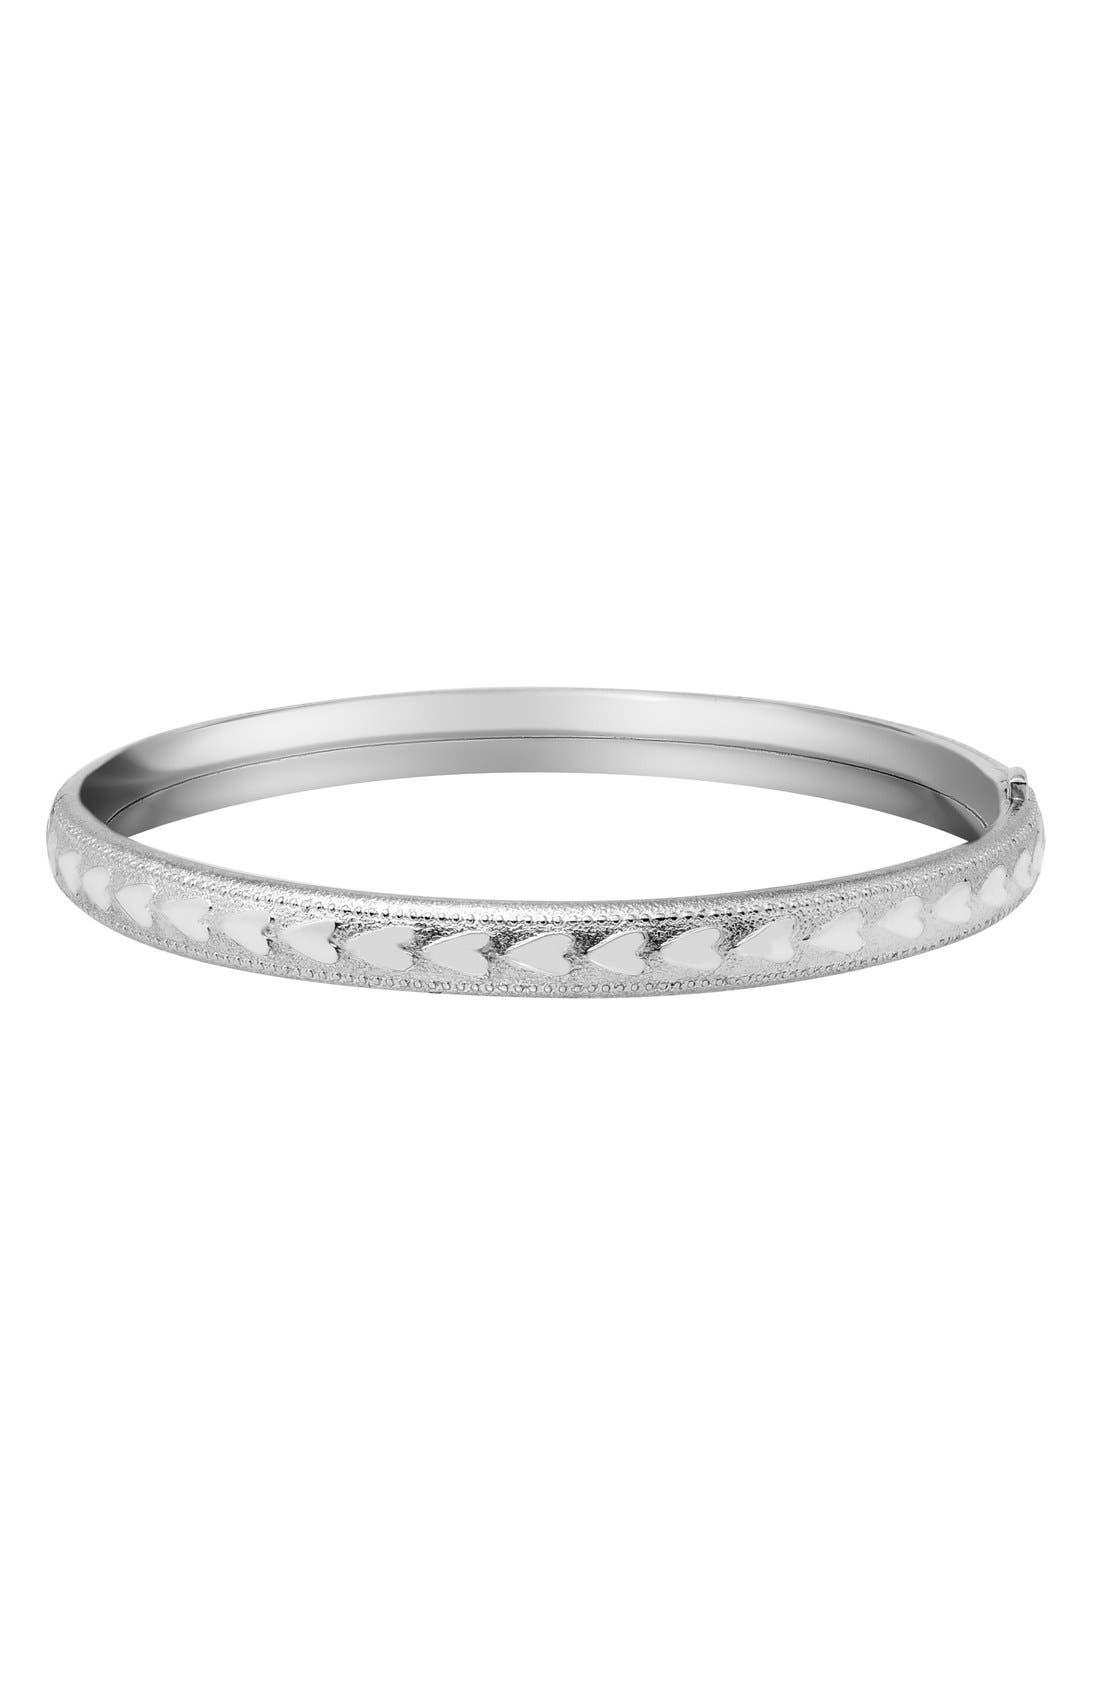 'Heart' Sterling Silver Bracelet,                         Main,                         color, Silver